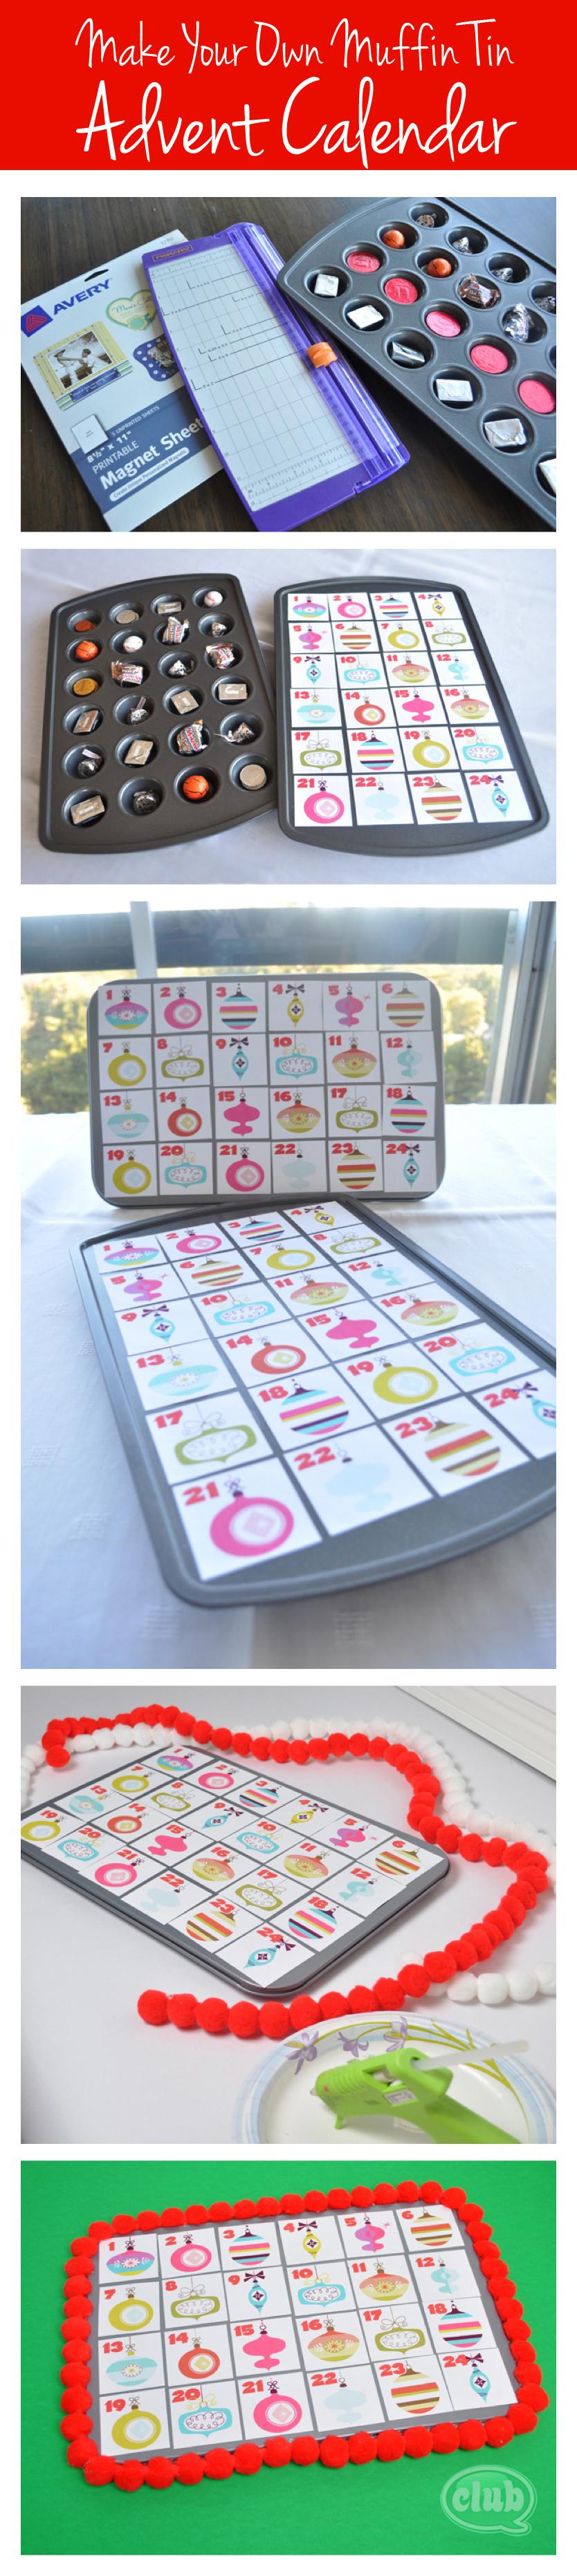 Diy Advent Calendar Muffin Tin : Make your own advent calendar and free printable